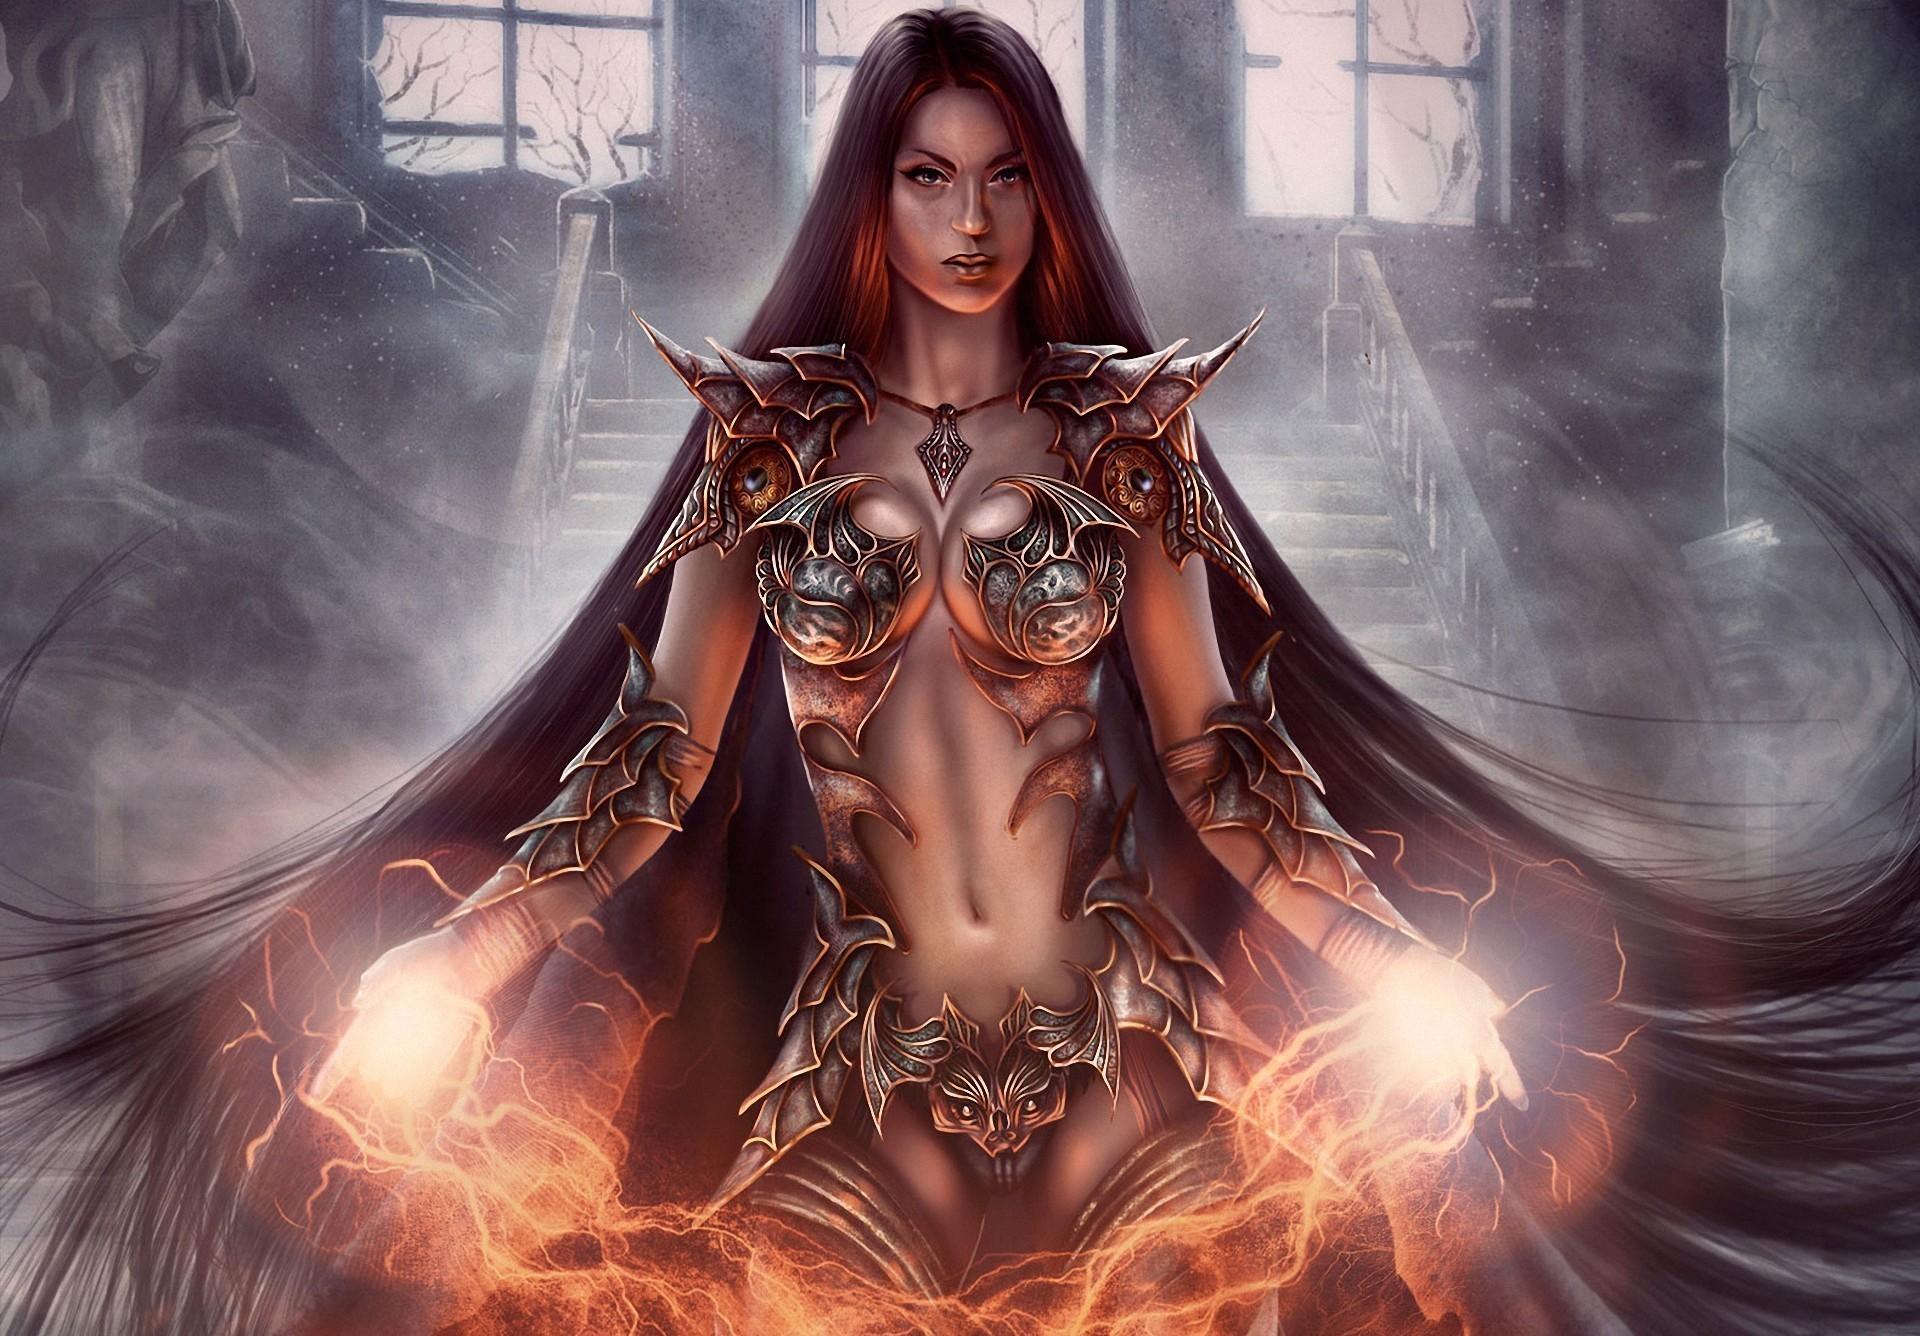 Magic Warriors Armor Fantasy Girls warrior wallpaper | | 103461 |  WallpaperUP